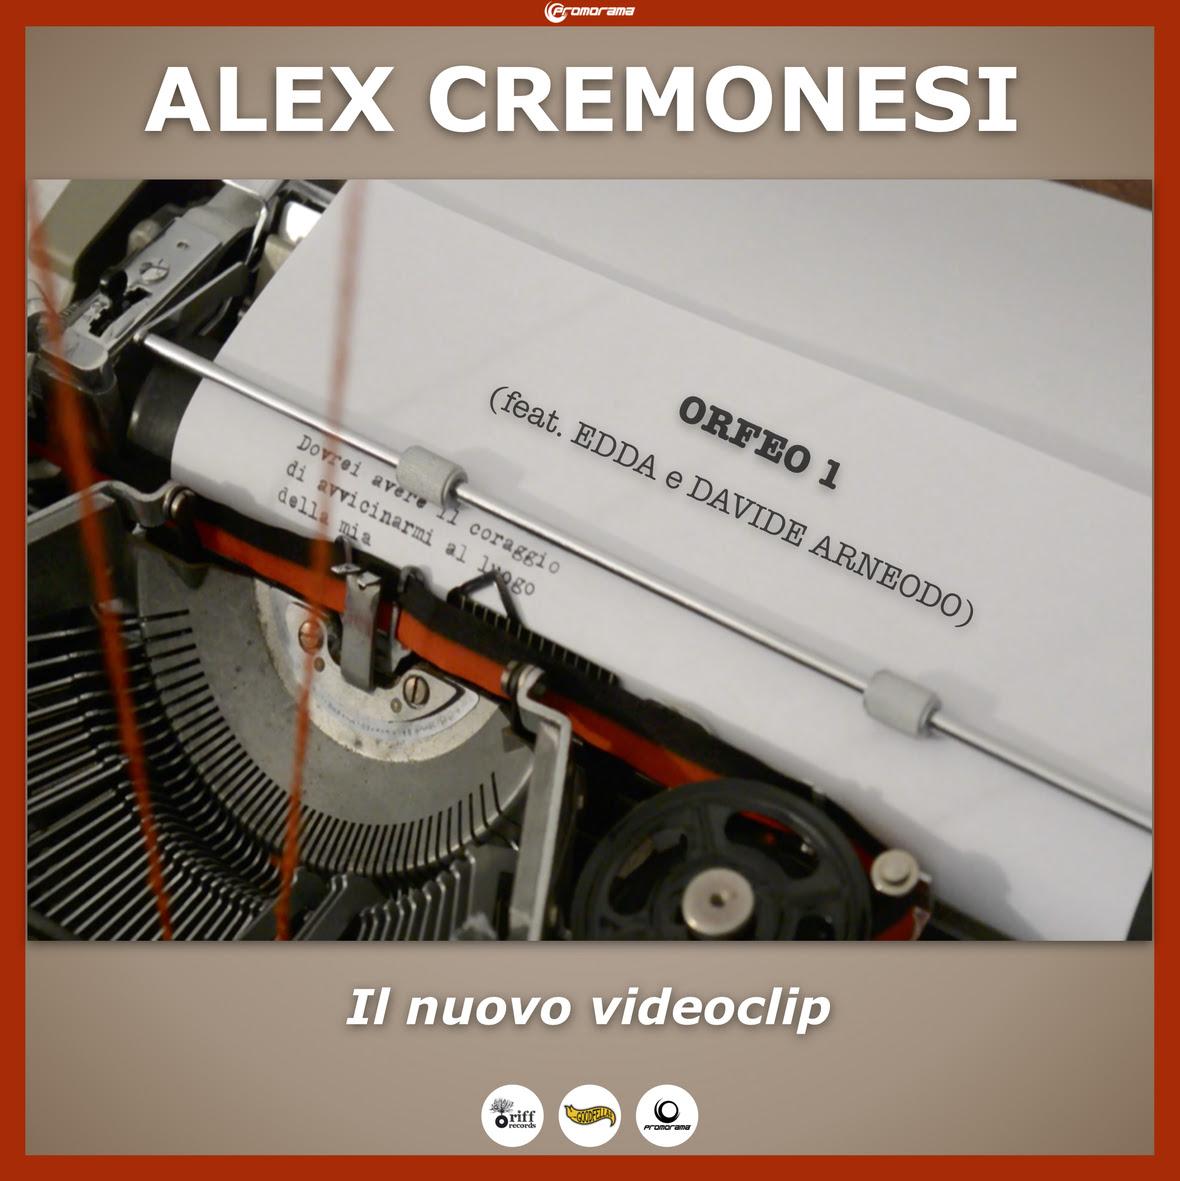 Cremonesi Orfeo 1 videoclip